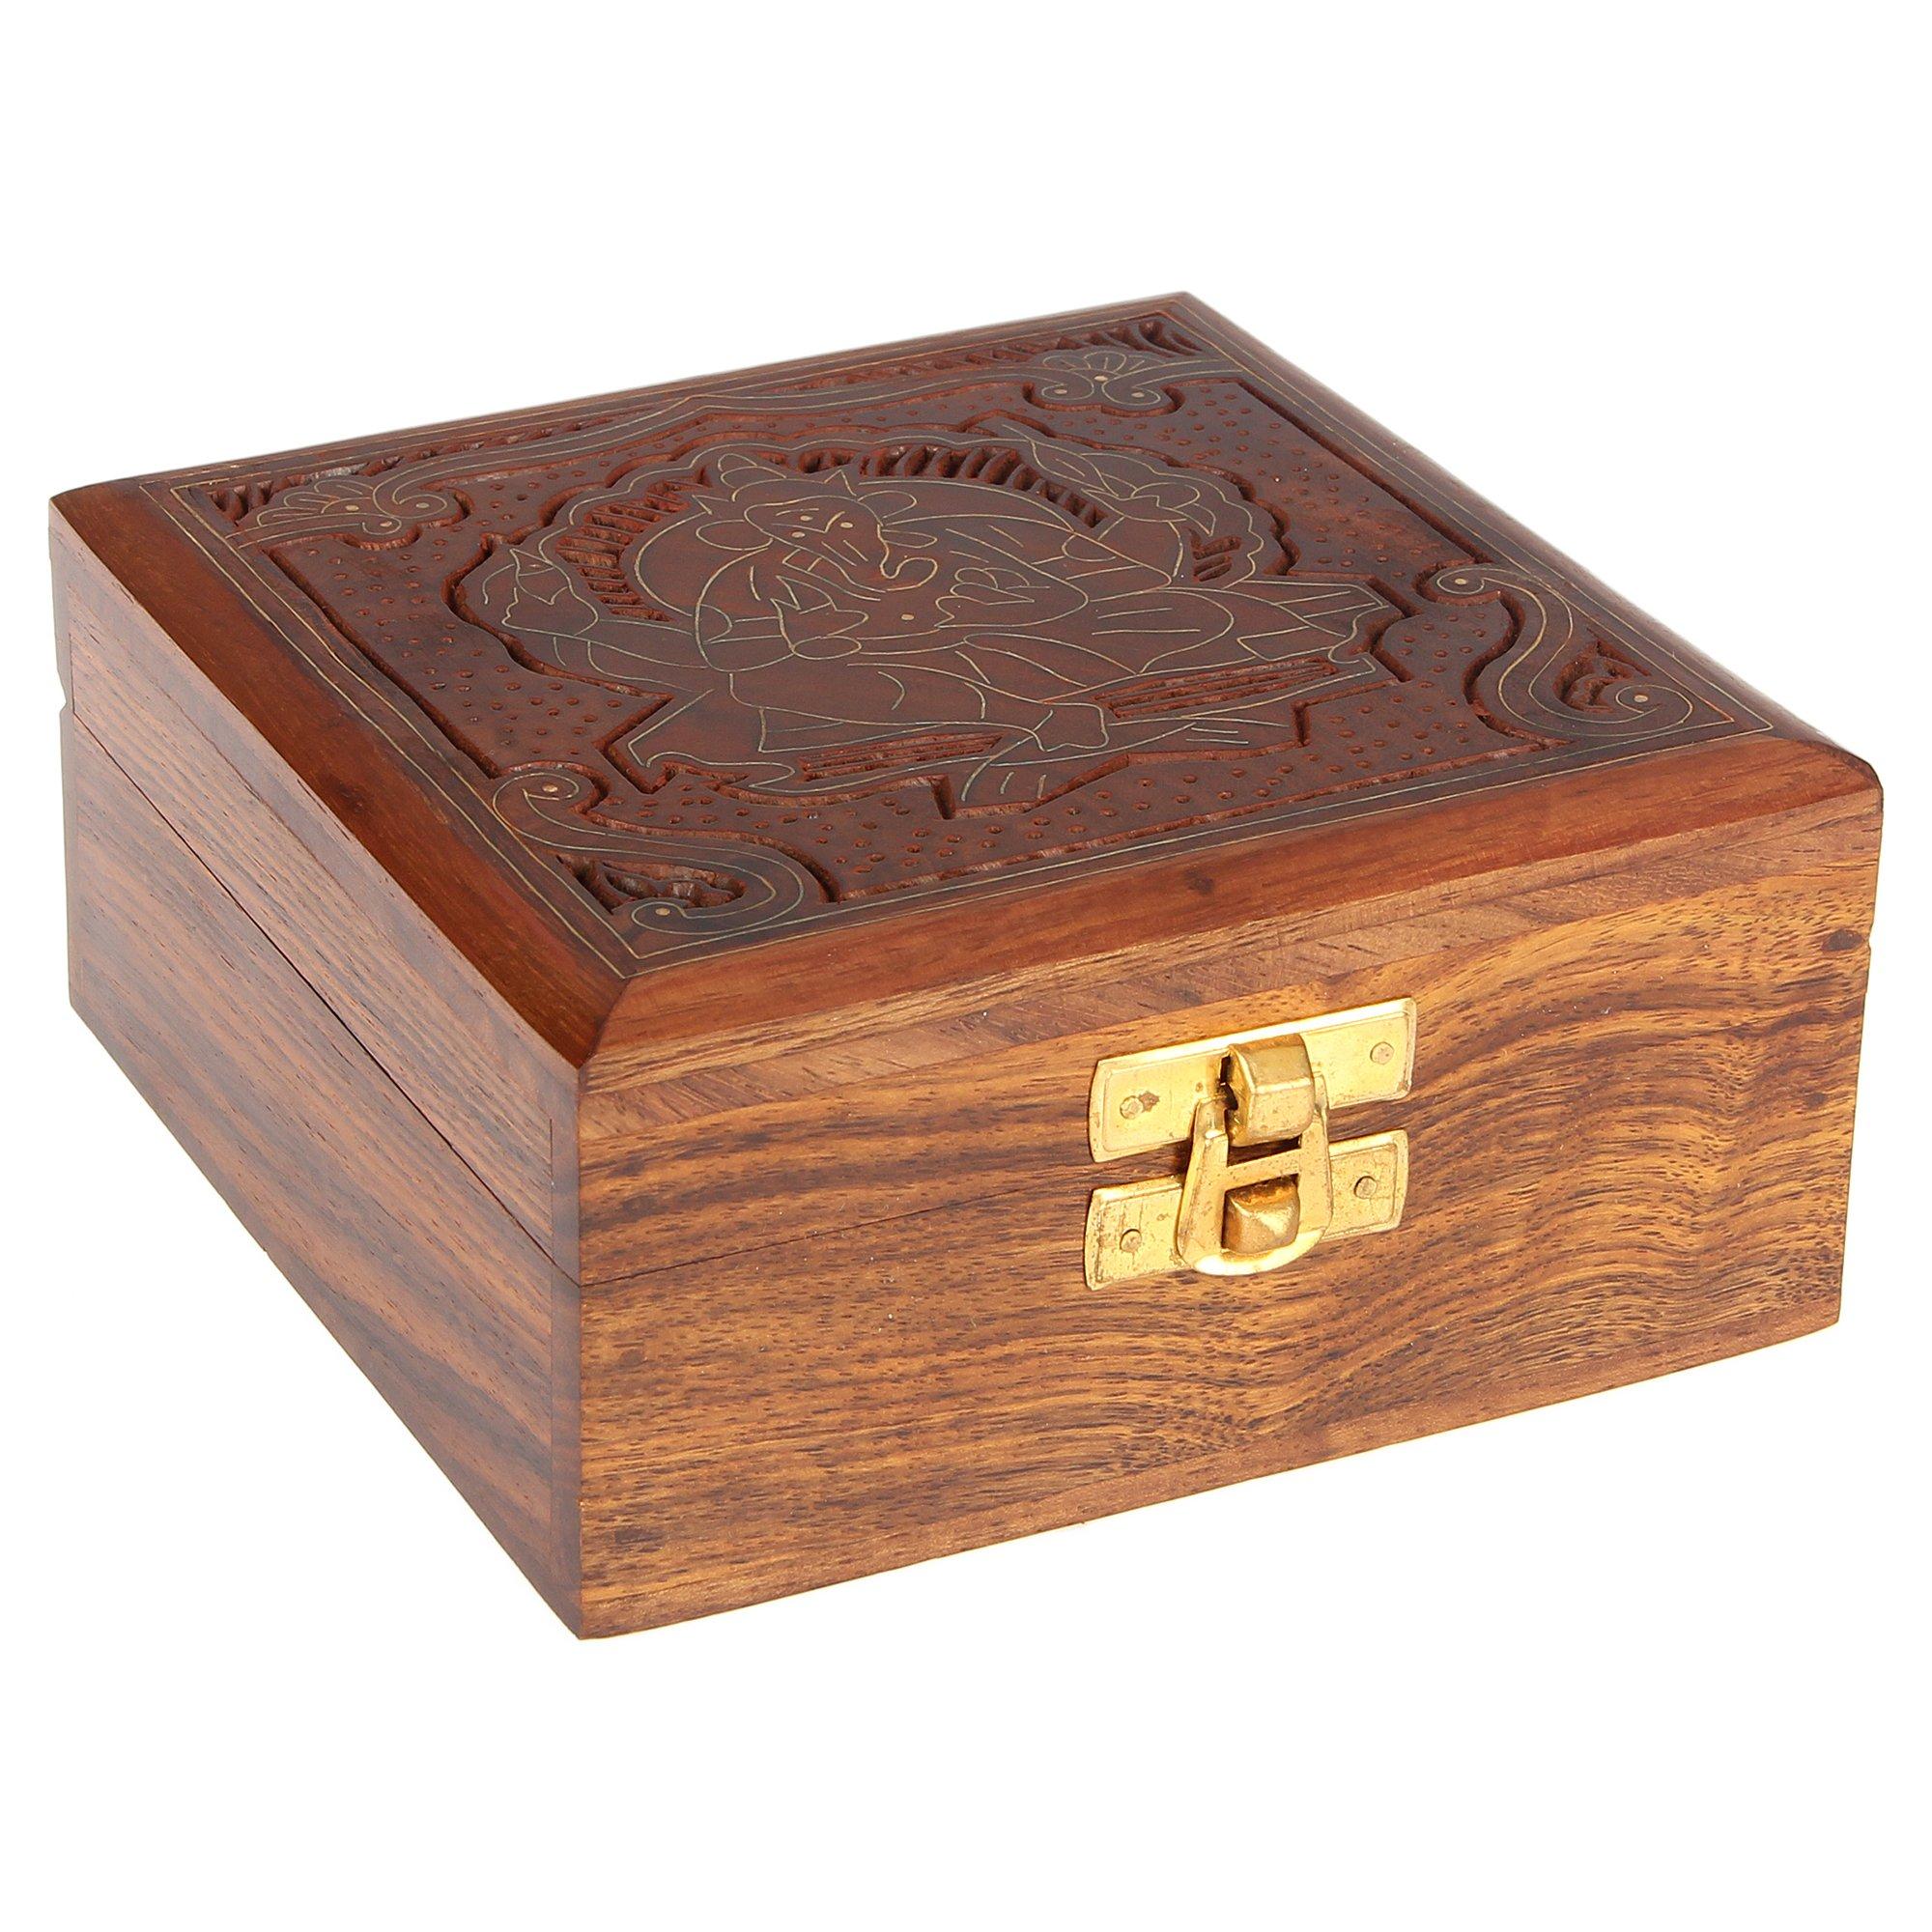 ShalinIndia Handmade Indian Wood Jewelry Box - Jewelry Box for Girls and Ladies Best Gifts for Women